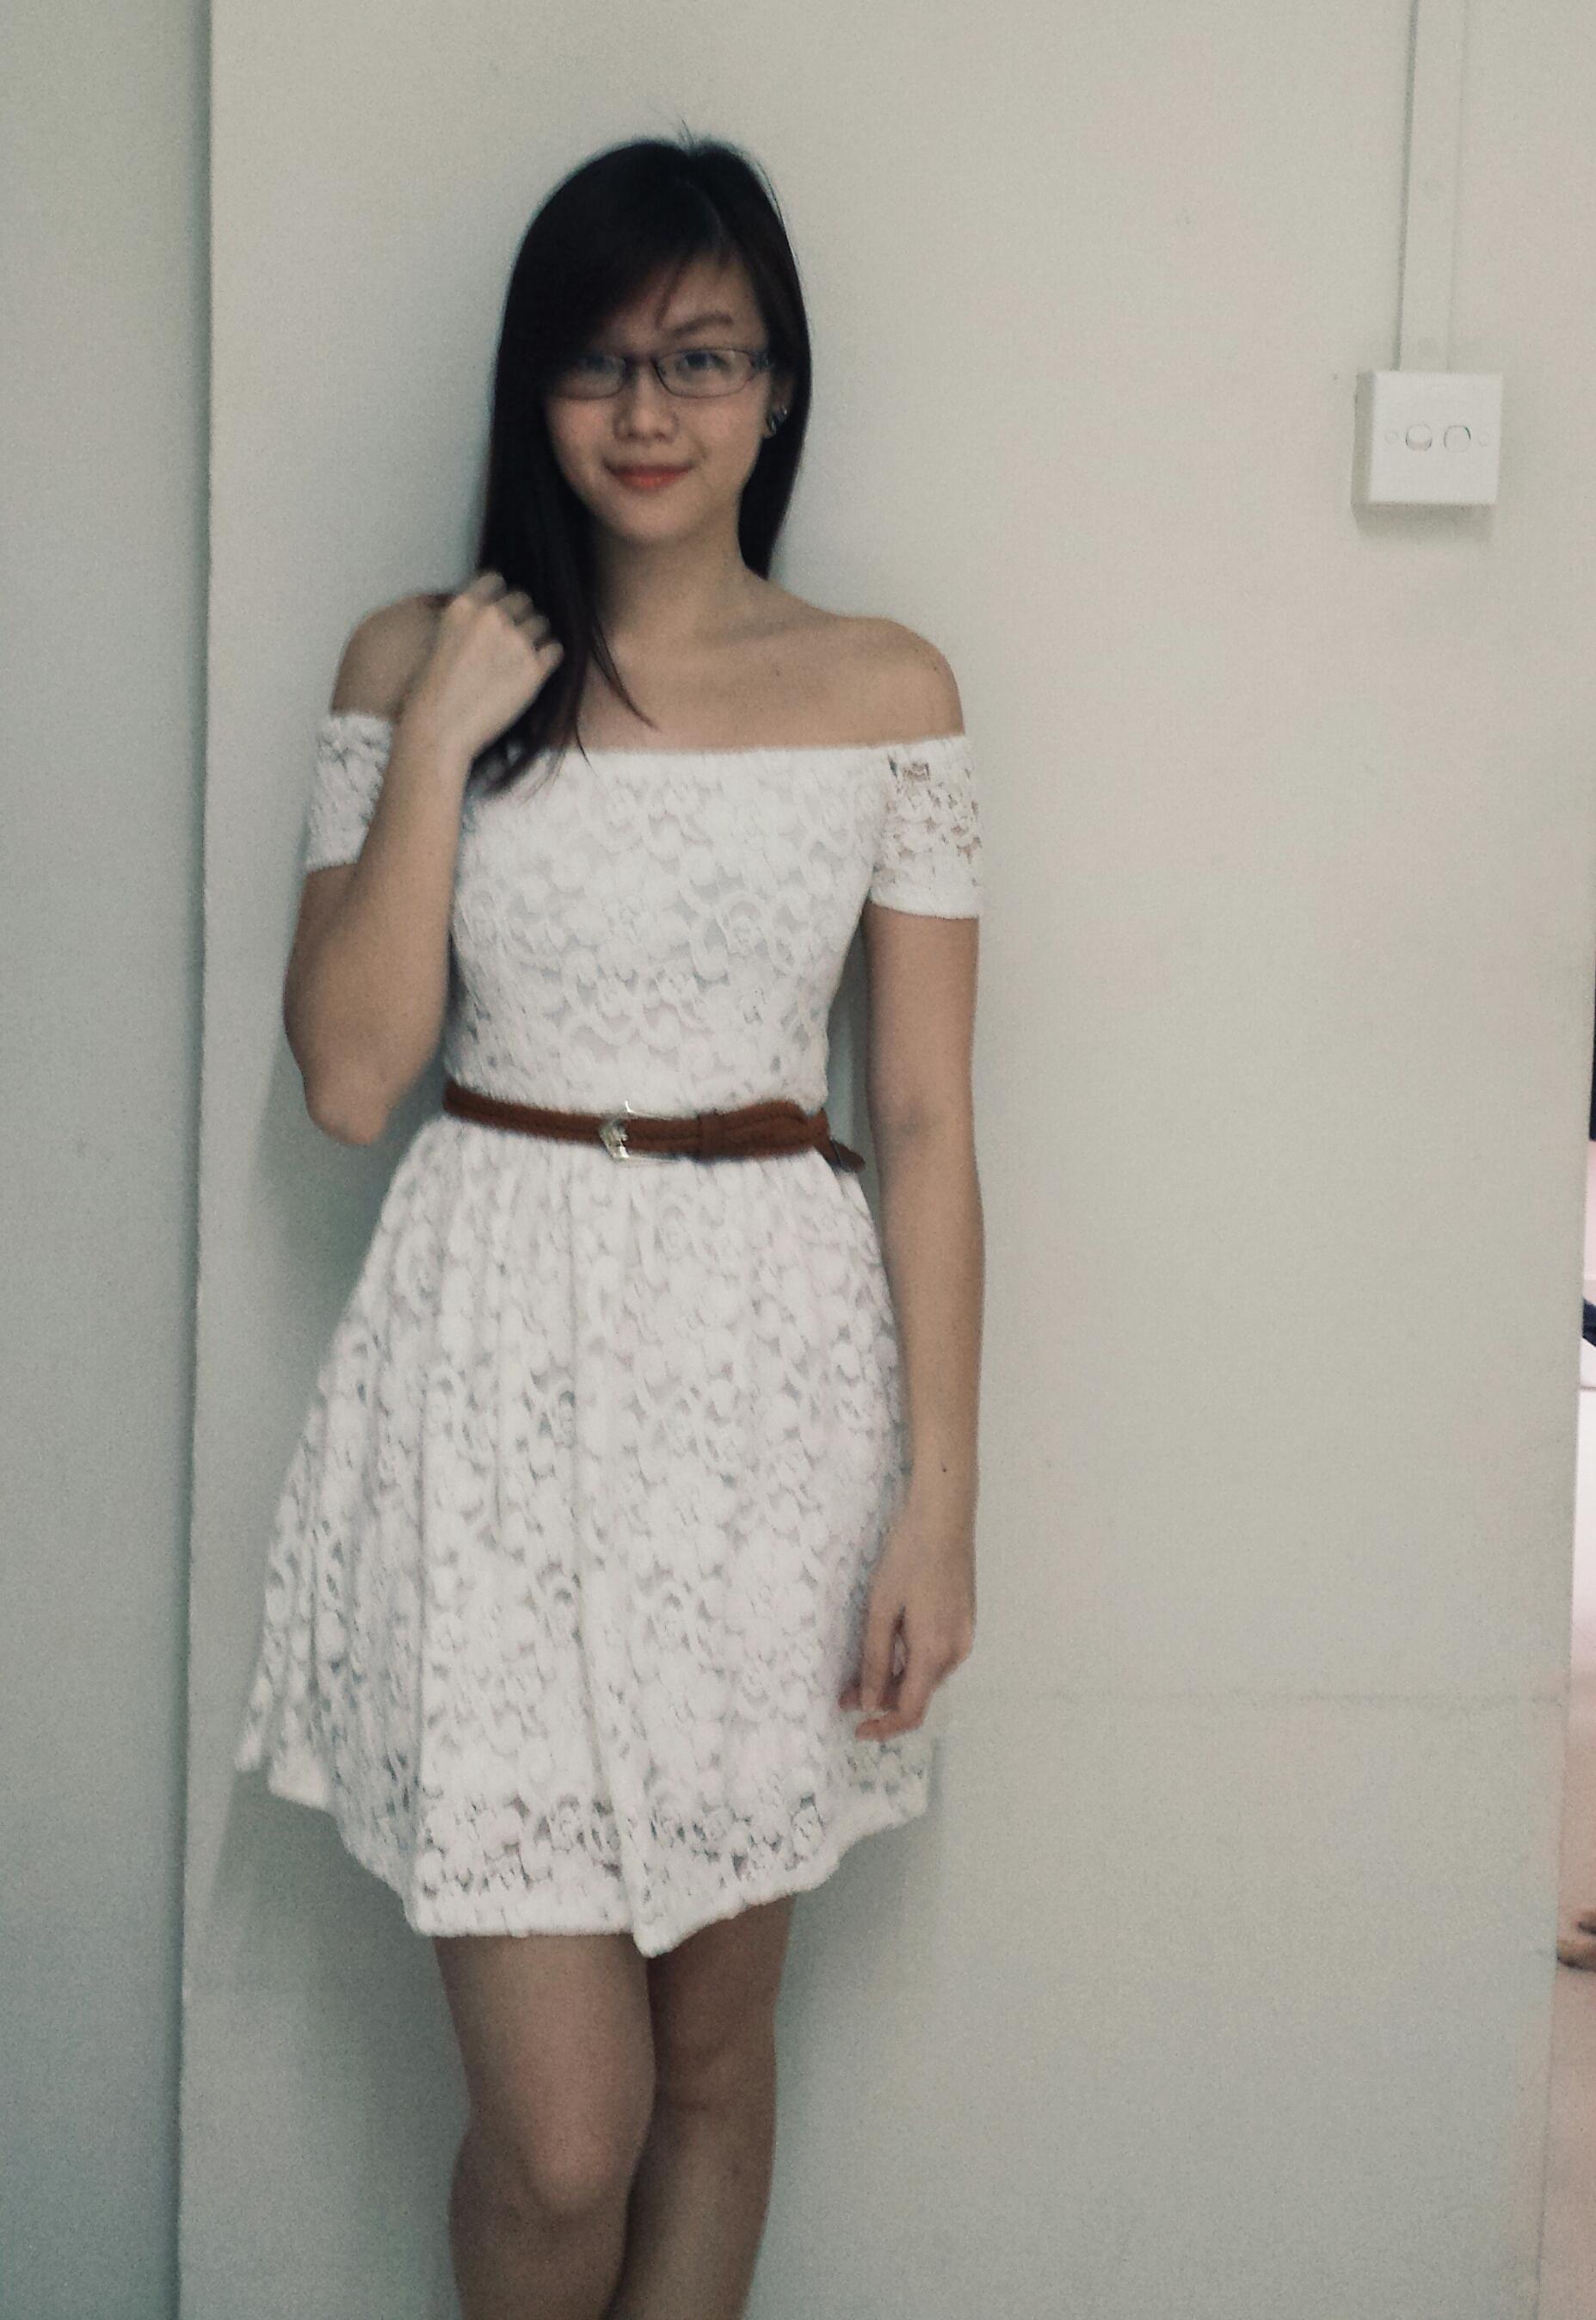 e4de973baa9a TTR Jingle Off-Shoulder Dress in Cream